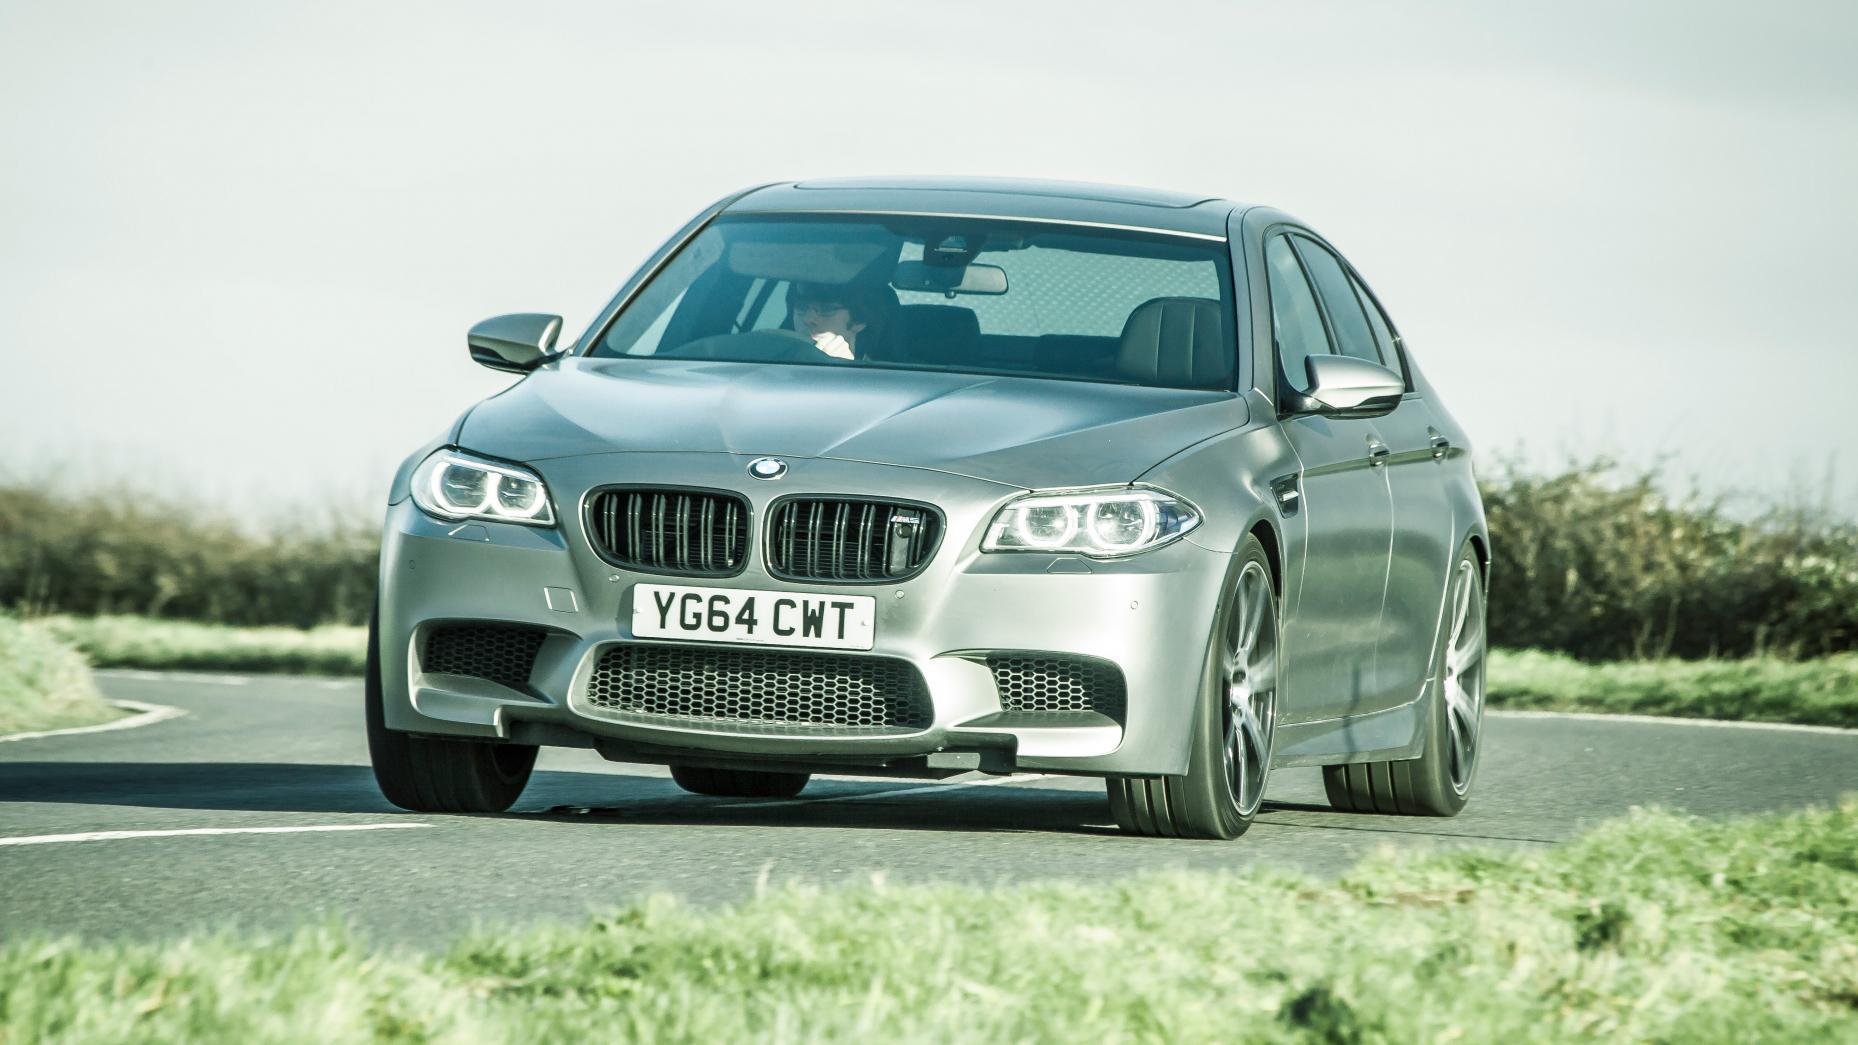 BMW M5 F10 berlina deportiva lujo